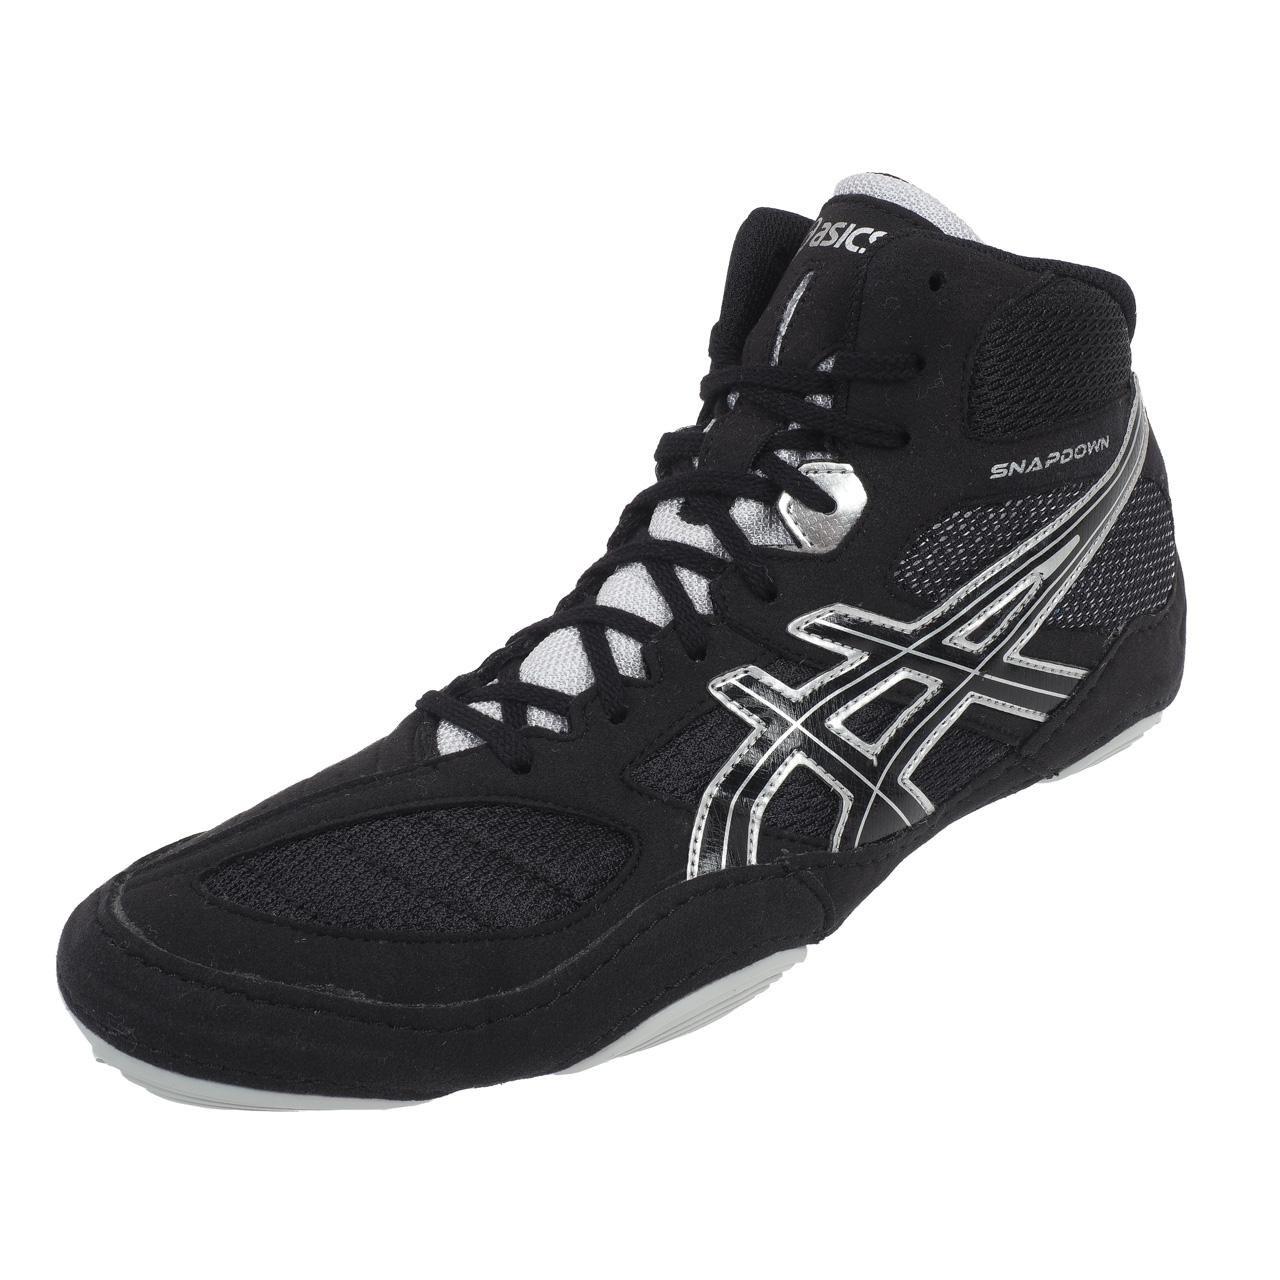 Asics timbre de lucha libre zapatos ASICS Snapdown–J502Y 9093–Negro/Plata